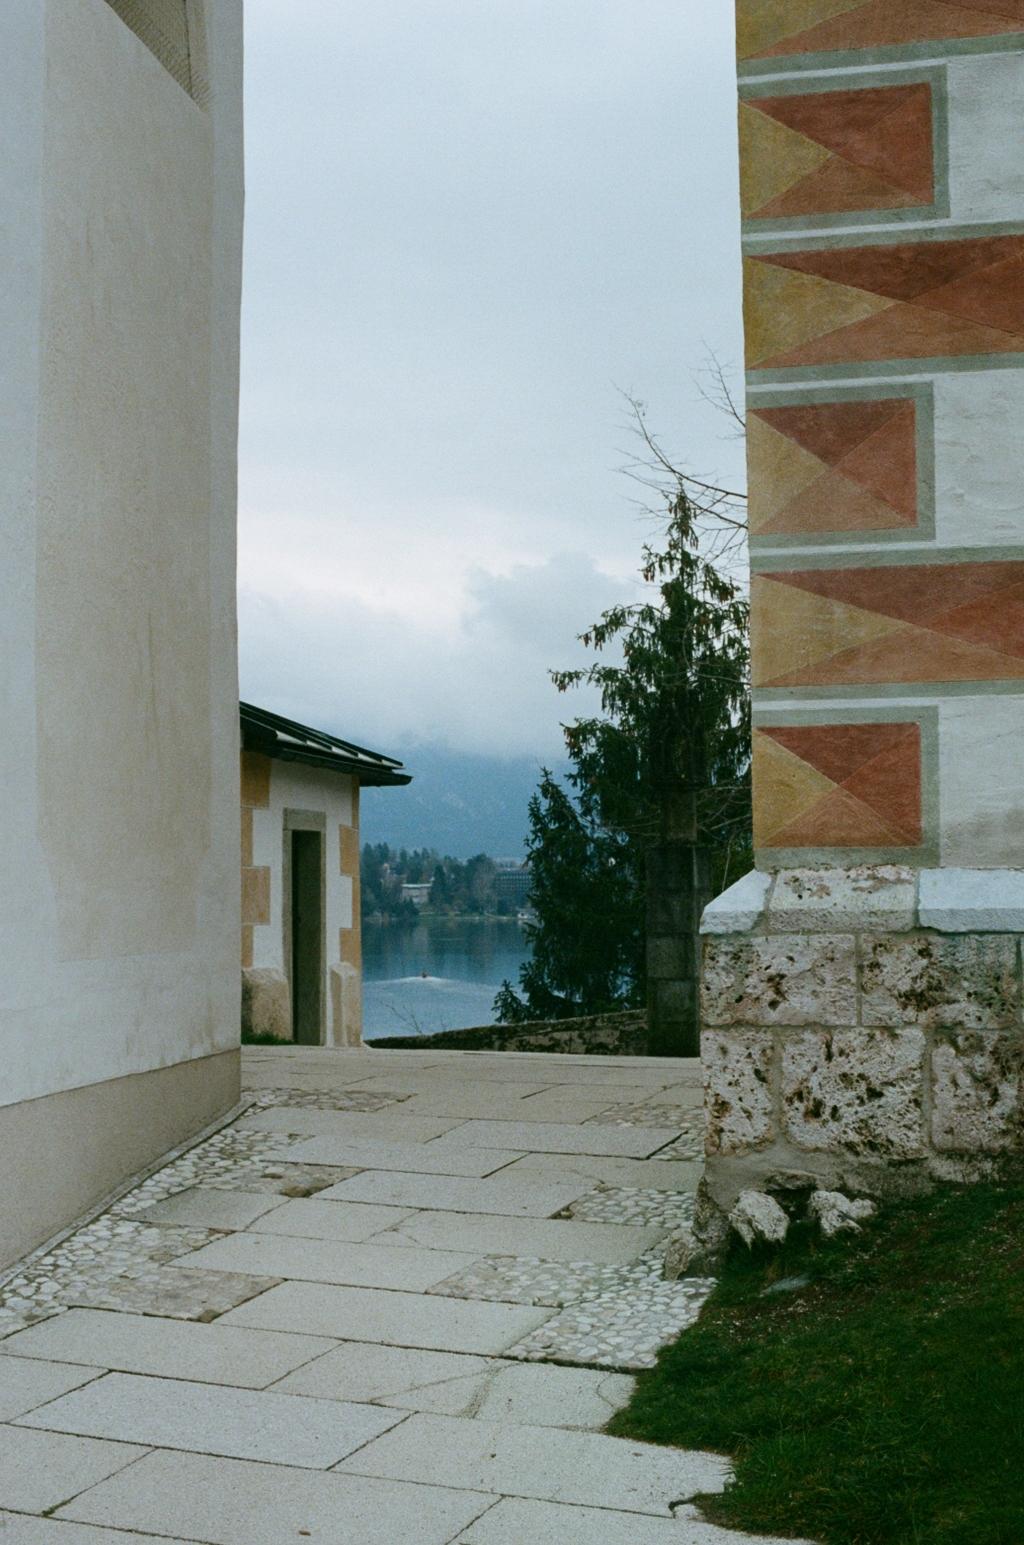 Bled Island. Lake Bled, Slovenia